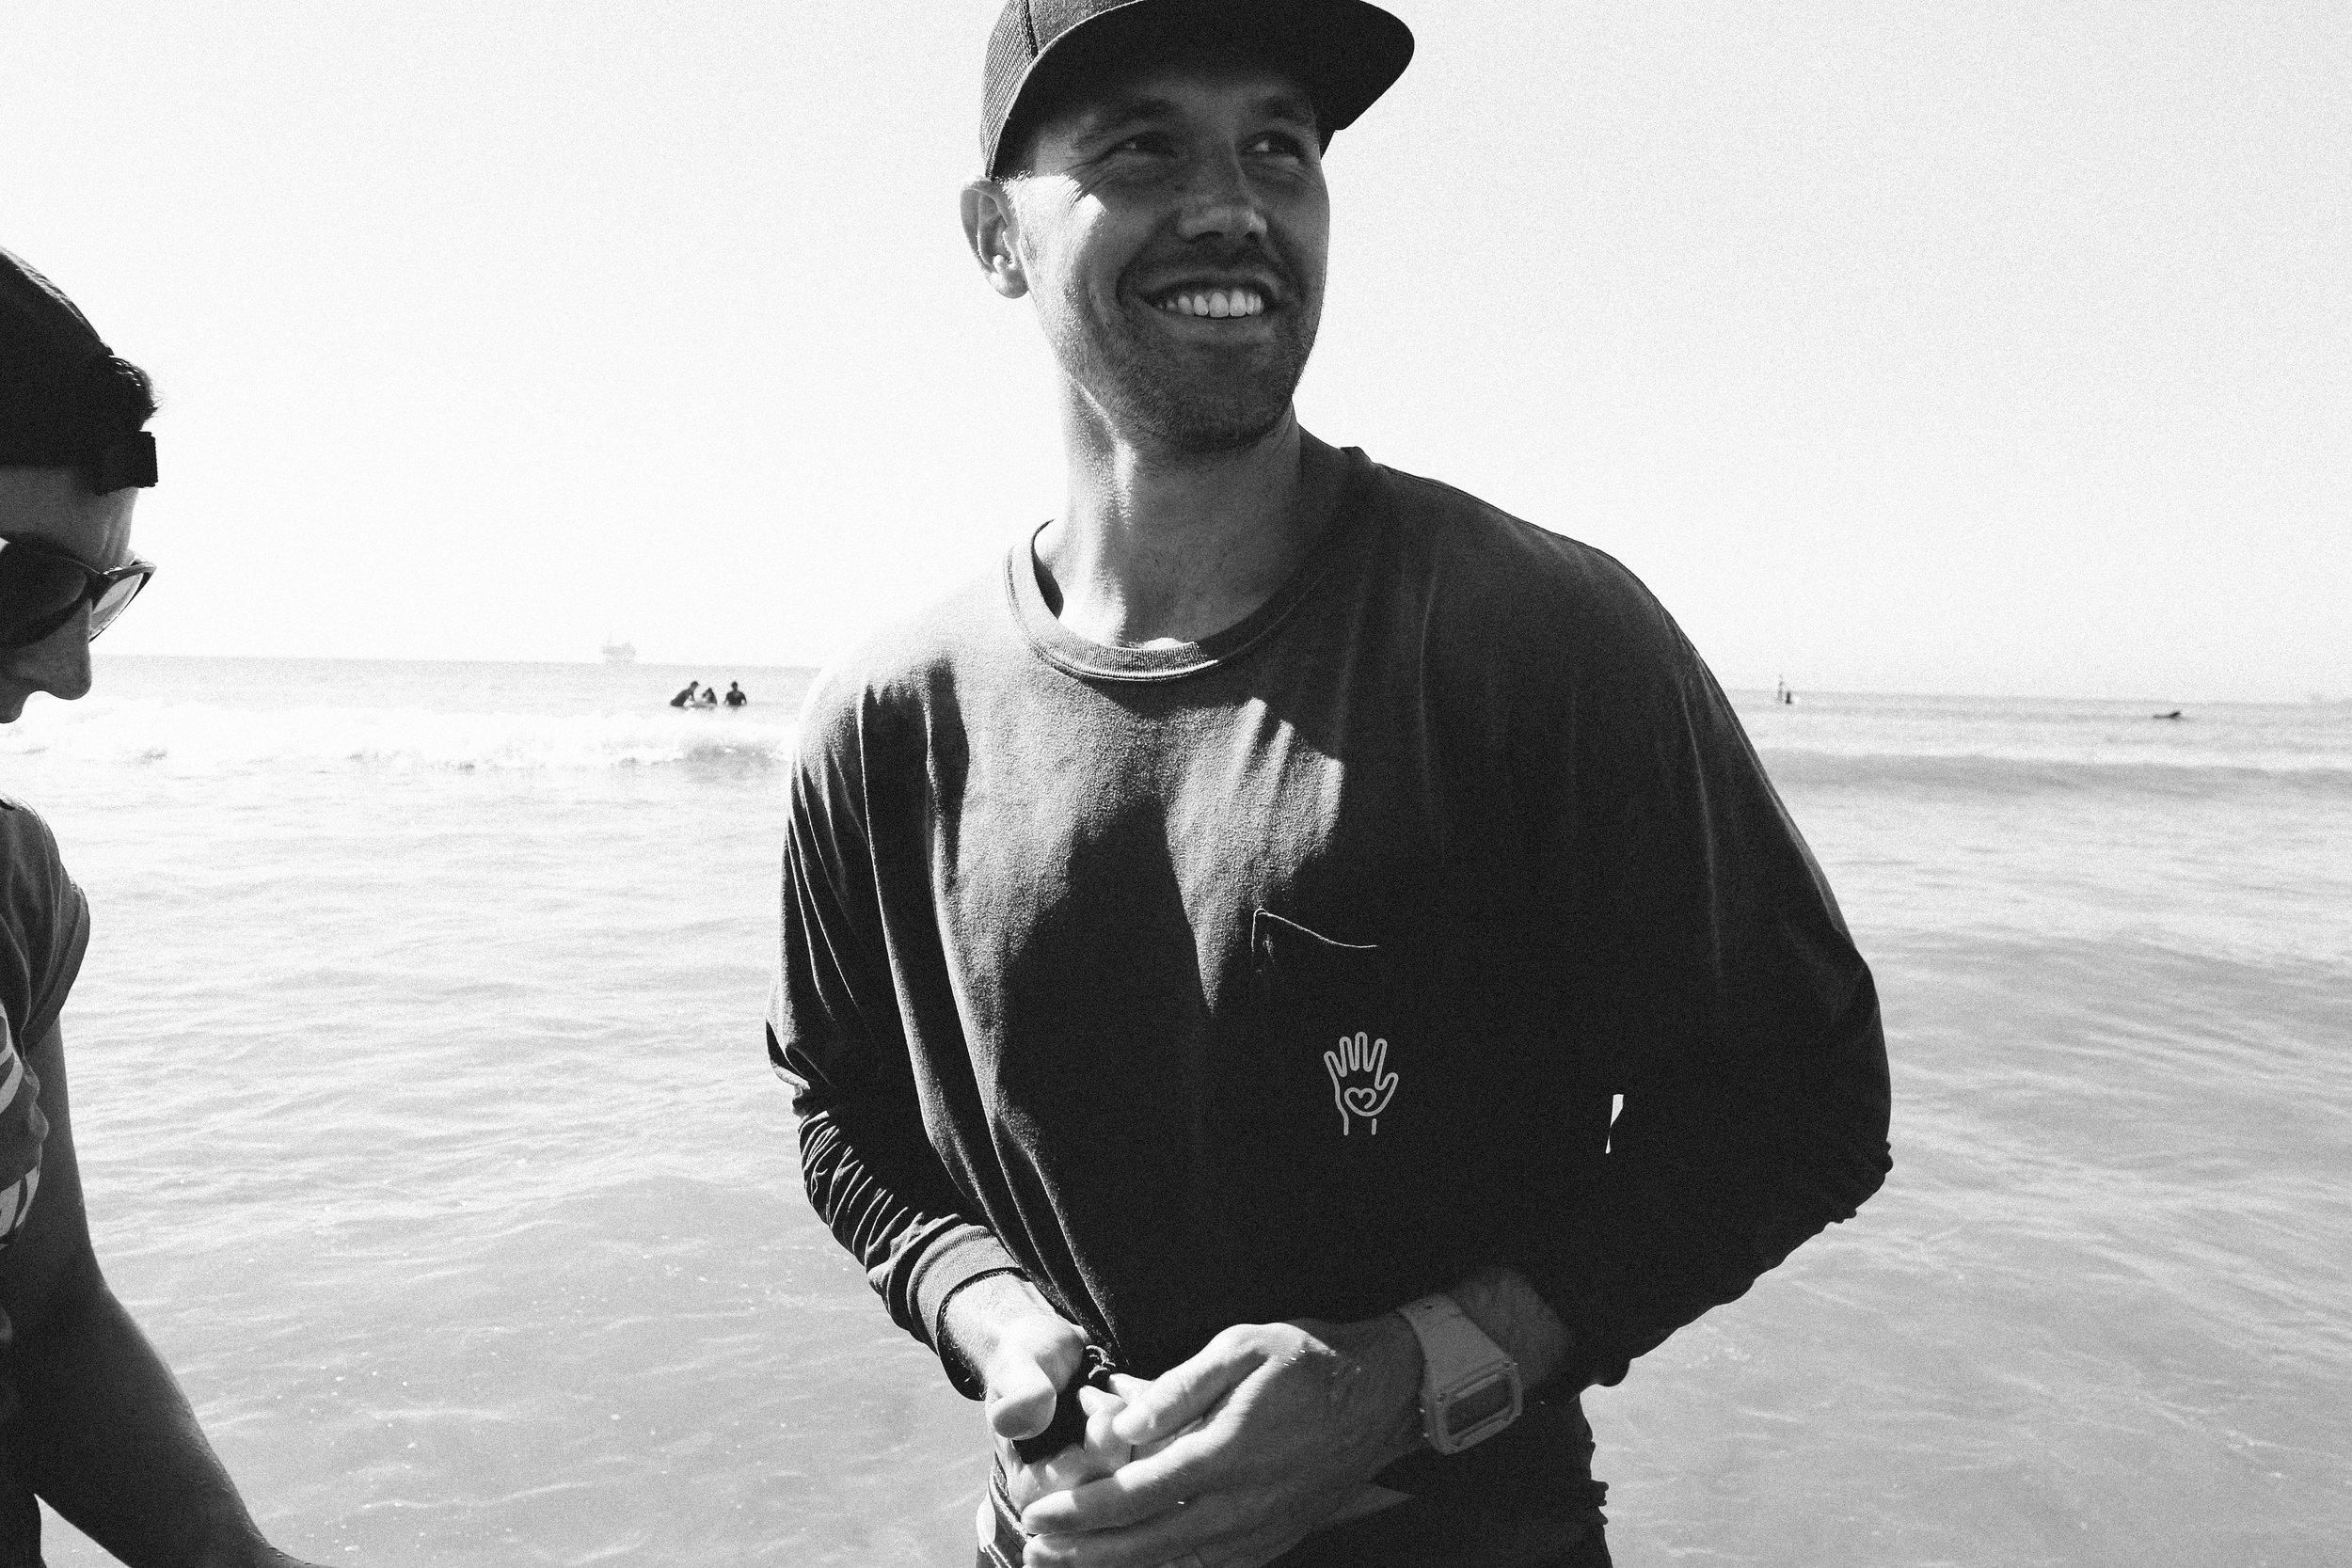 Adam Kunes - Idea Guy / Trip Leader